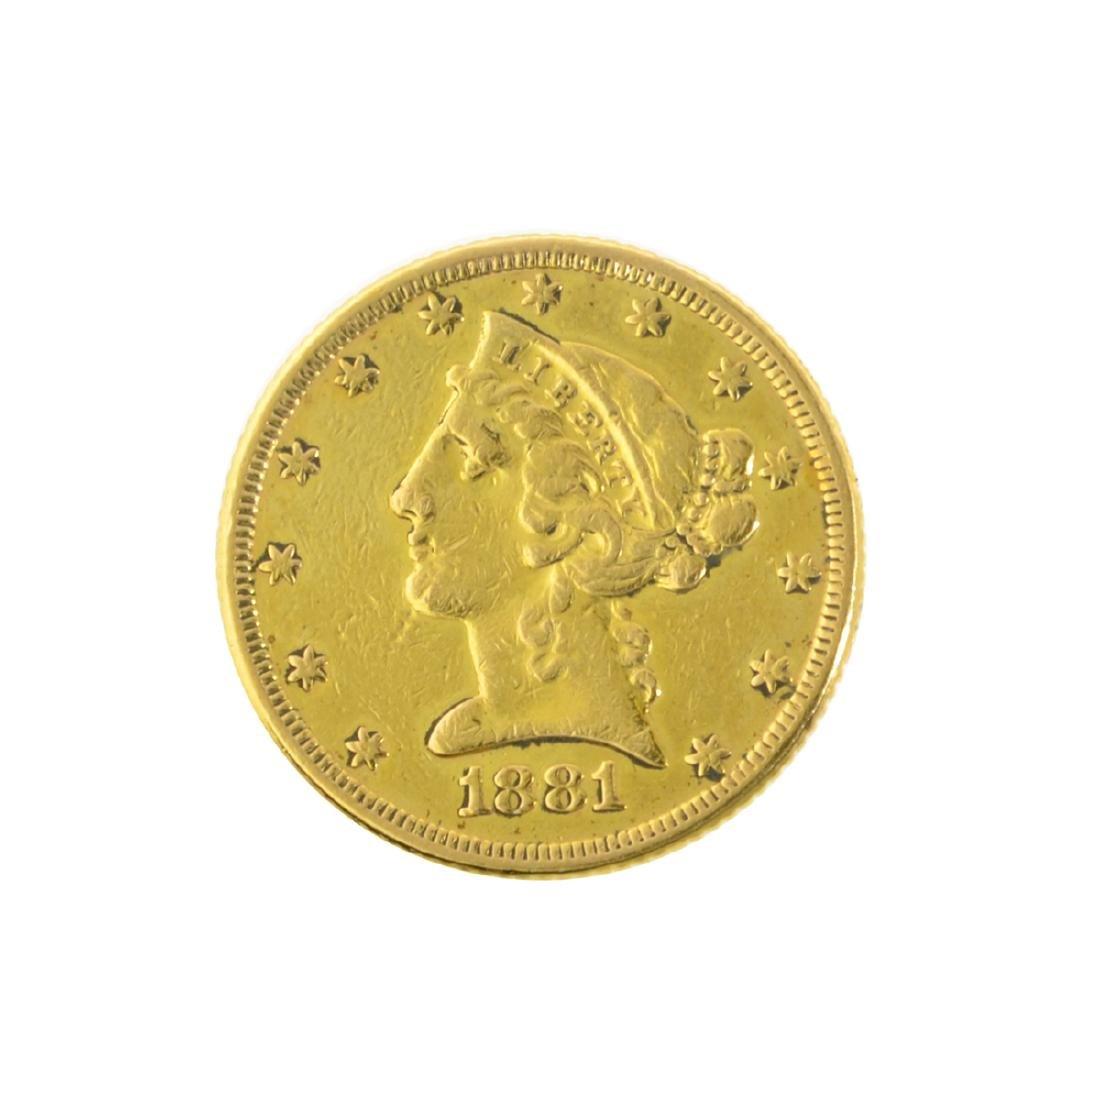 *1881 $5 U.S. Liberty Head Gold Coin (JG-MRT)